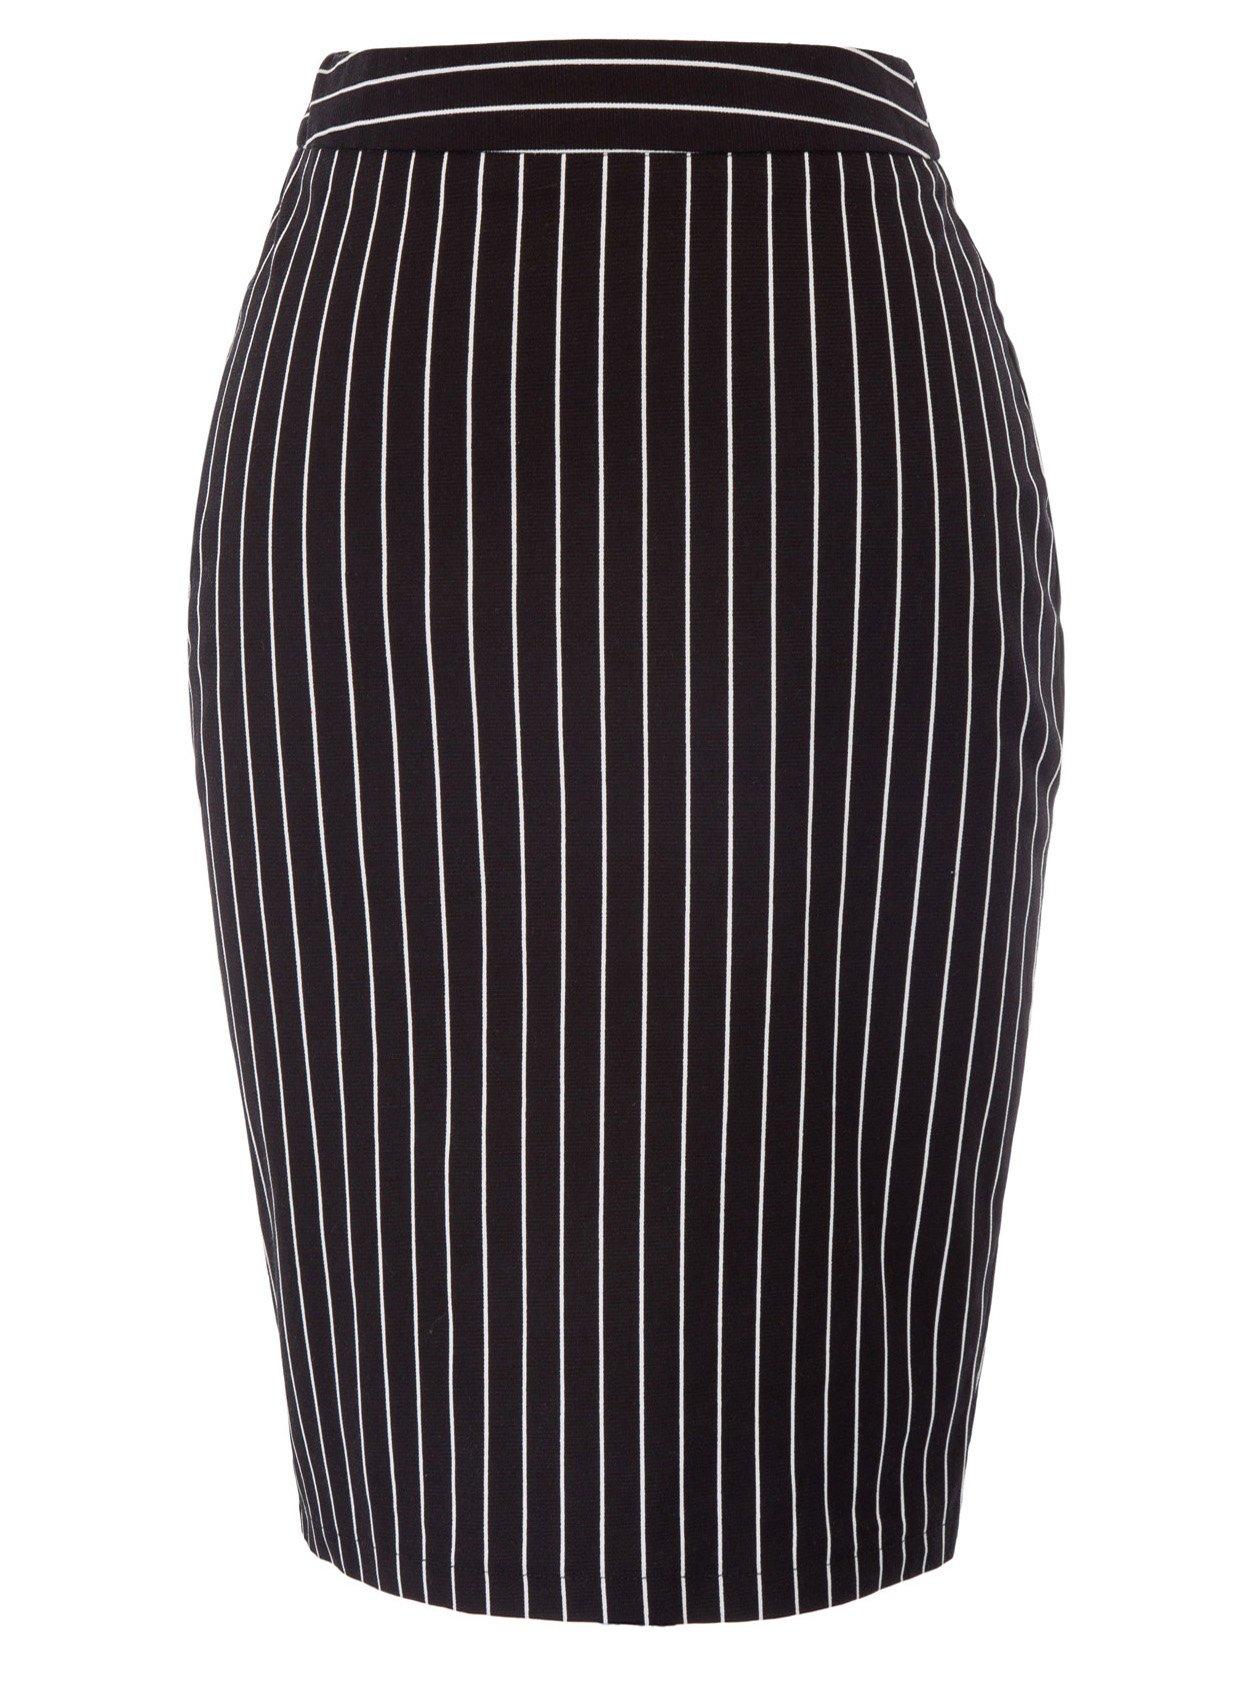 Kate Kasin Womens Soft Pencil Skirt Cotton Slim Fit Business Skirt Size L